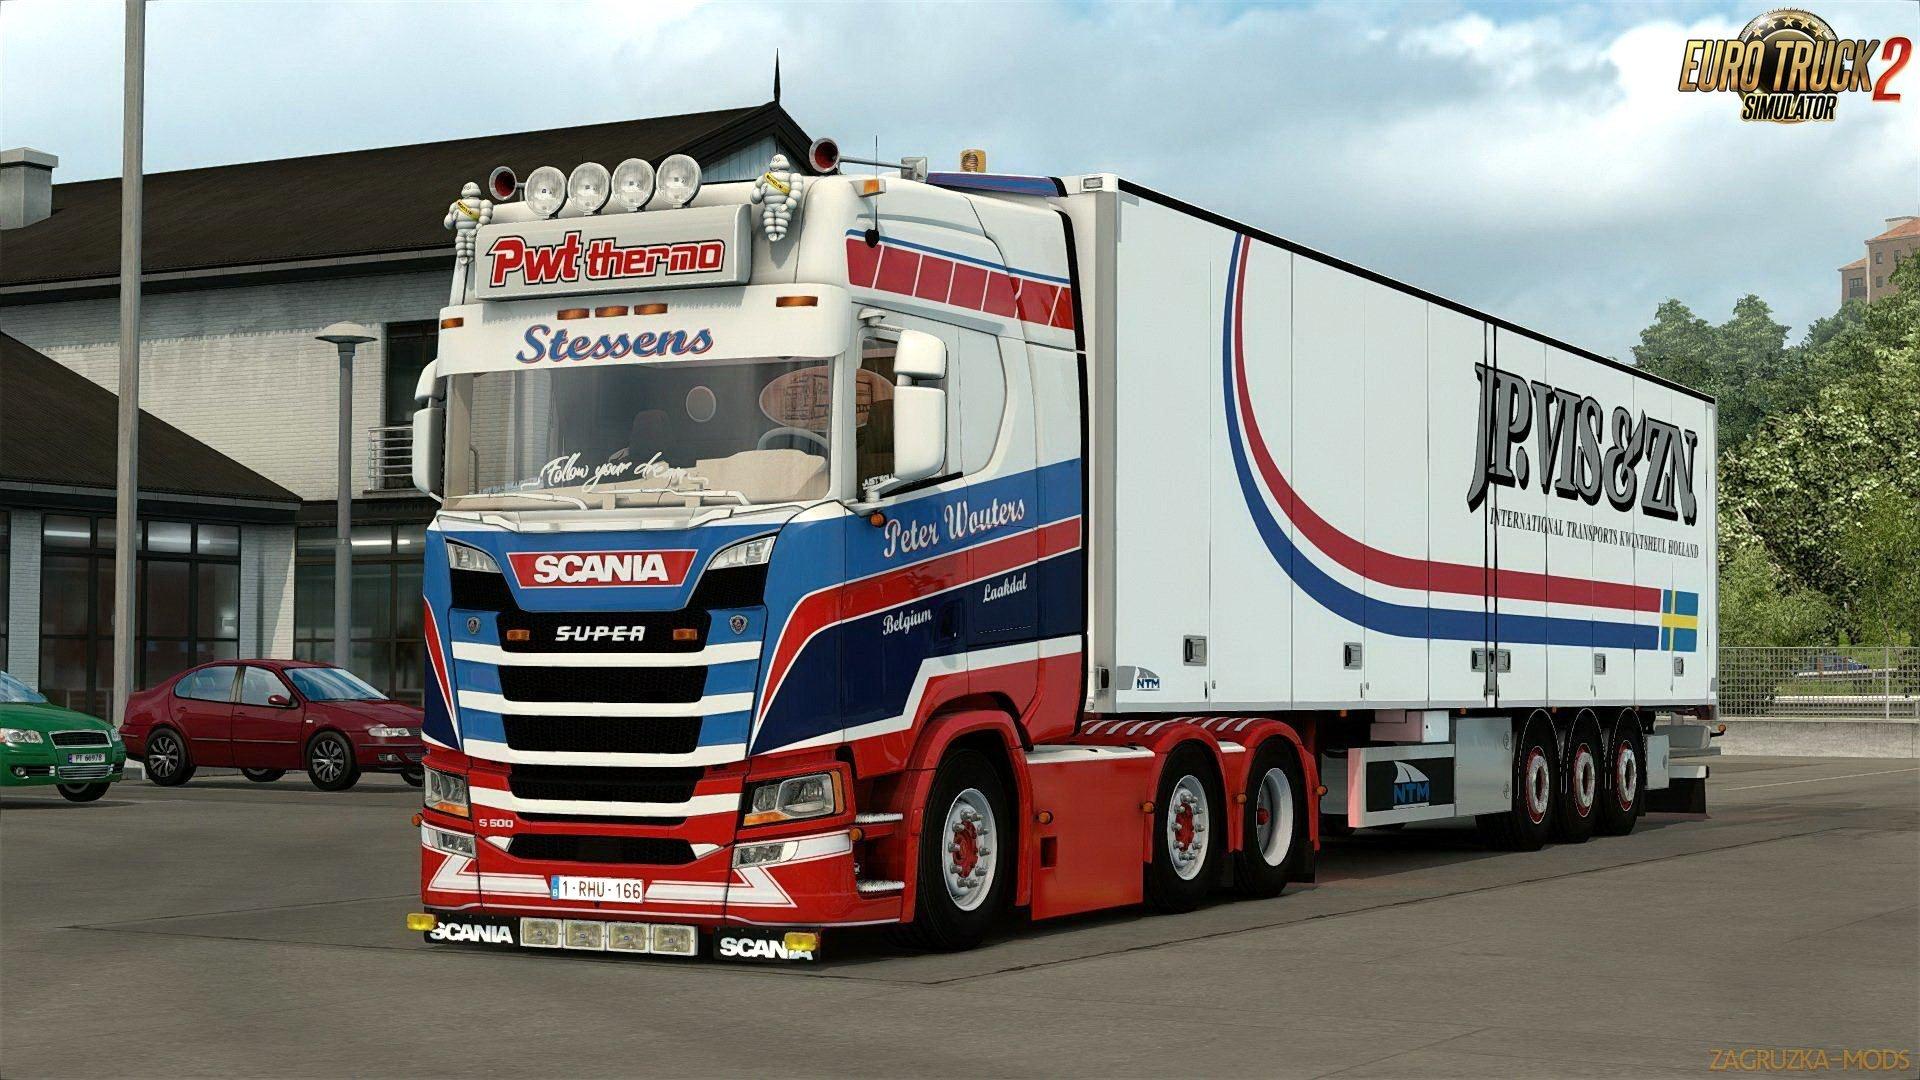 Scania NextGen S500 PWT Thermo Stessens v1.0 (1.36.x) for ETS 2